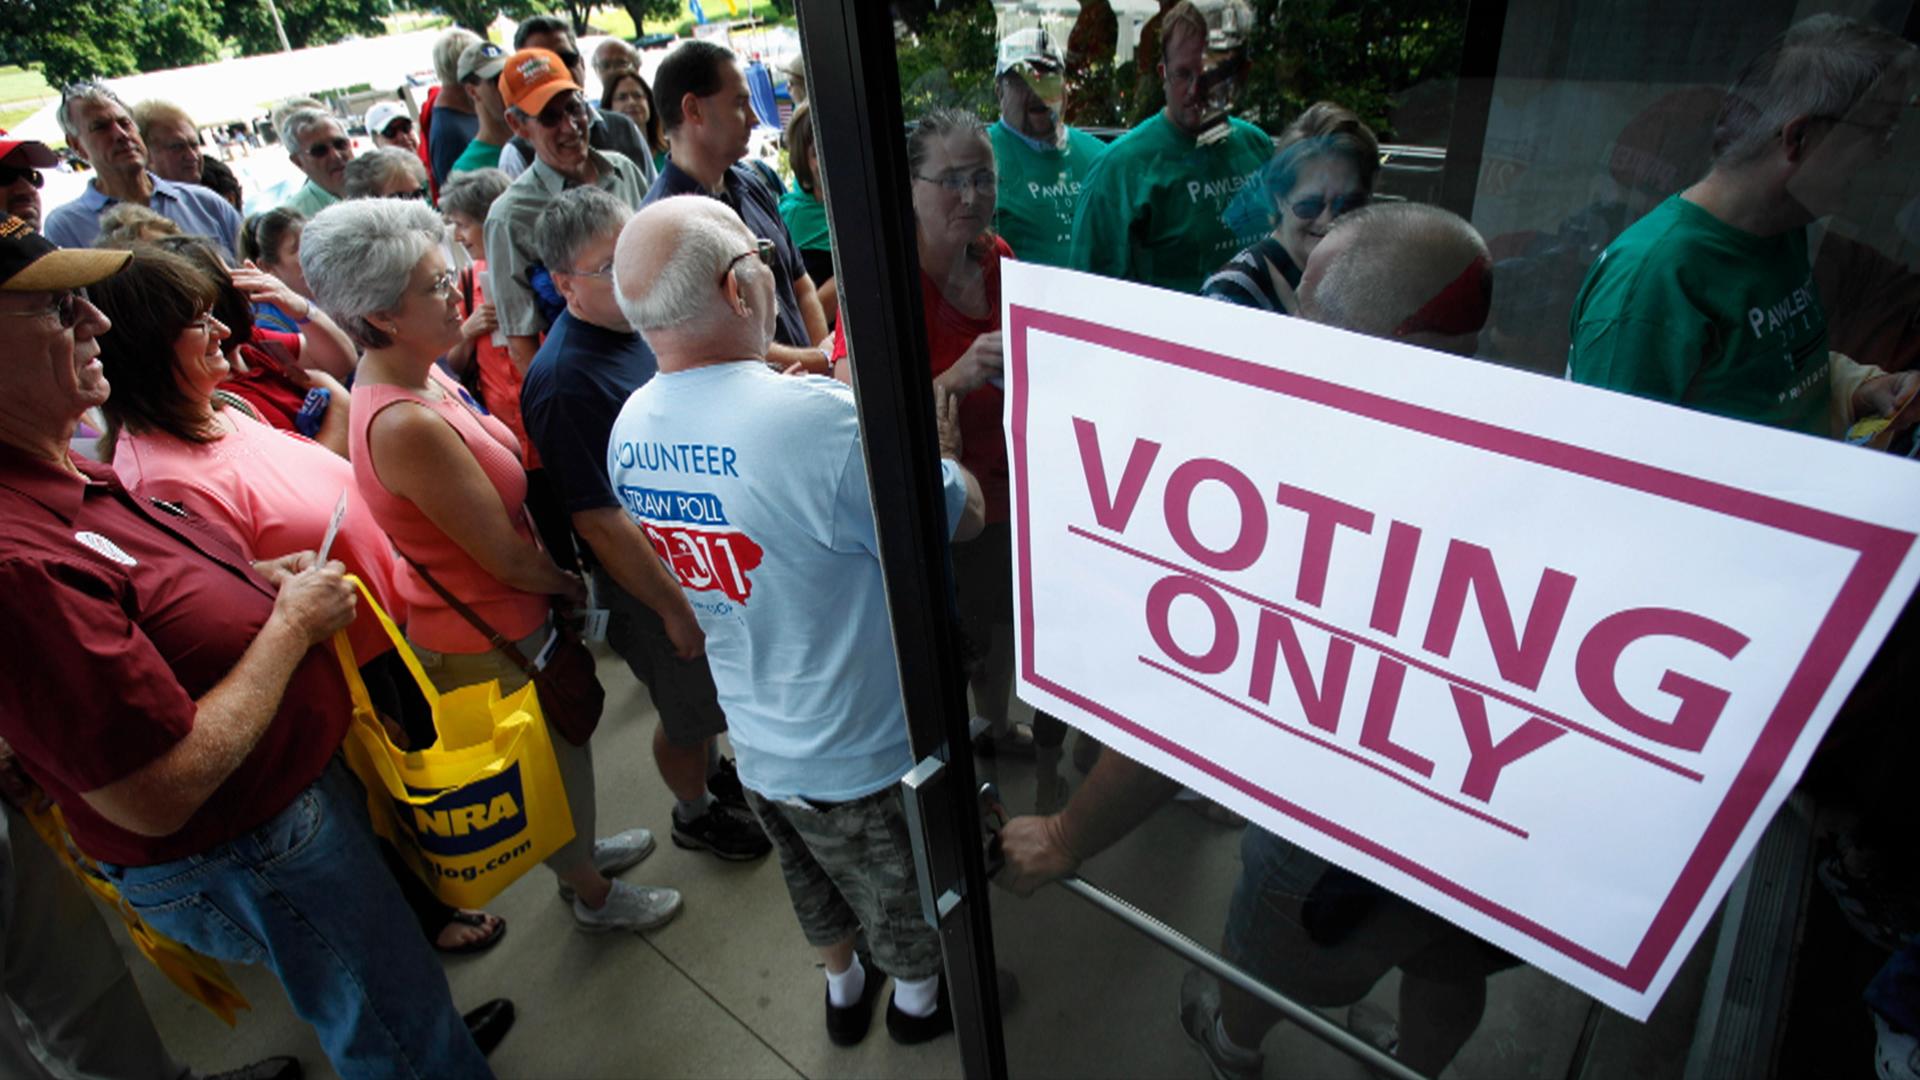 Iowa's politics has changed dramatically